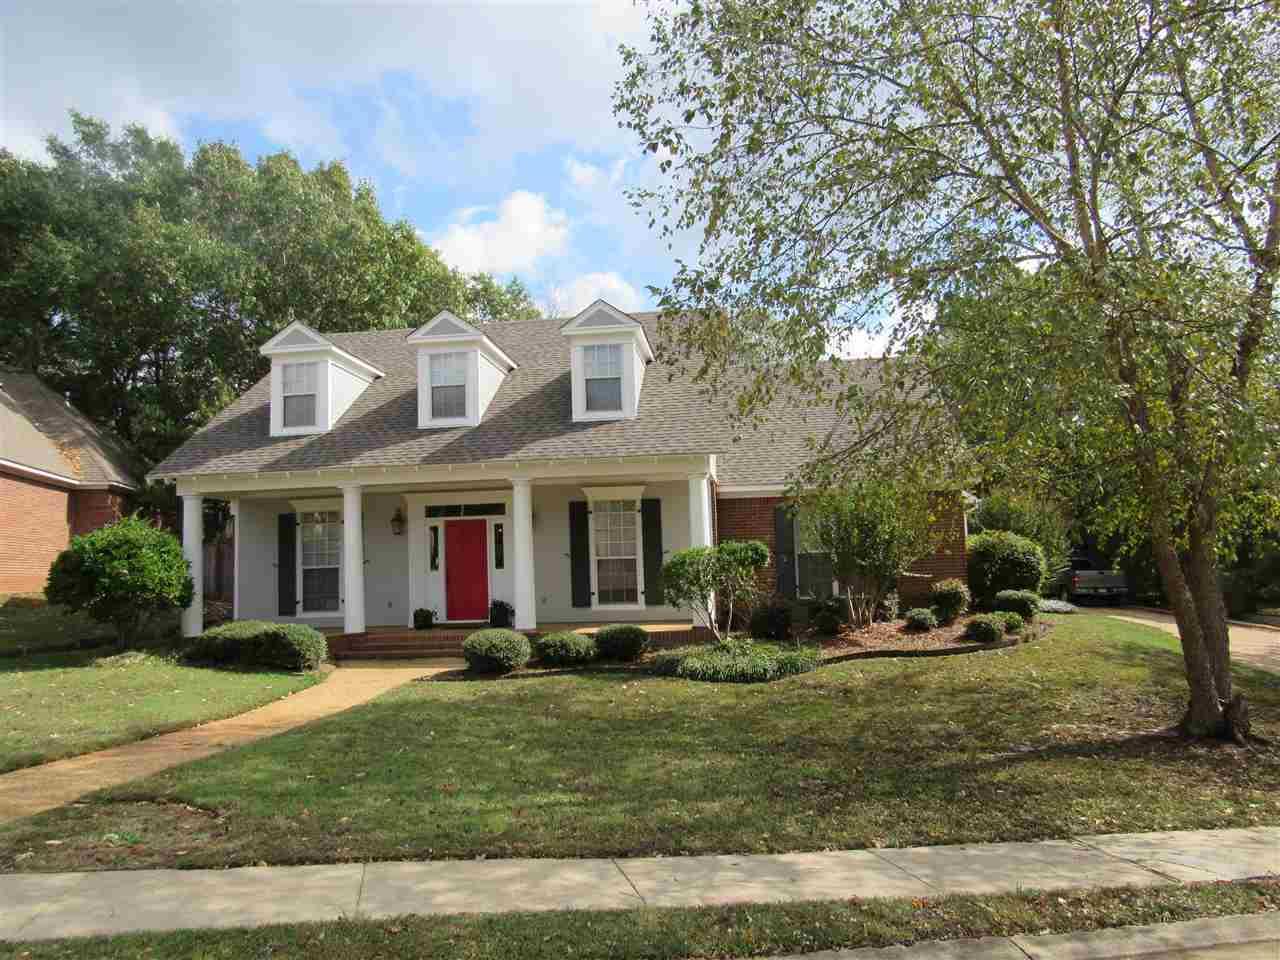 Real Estate for Sale, ListingId: 35999008, Madison,MS39110